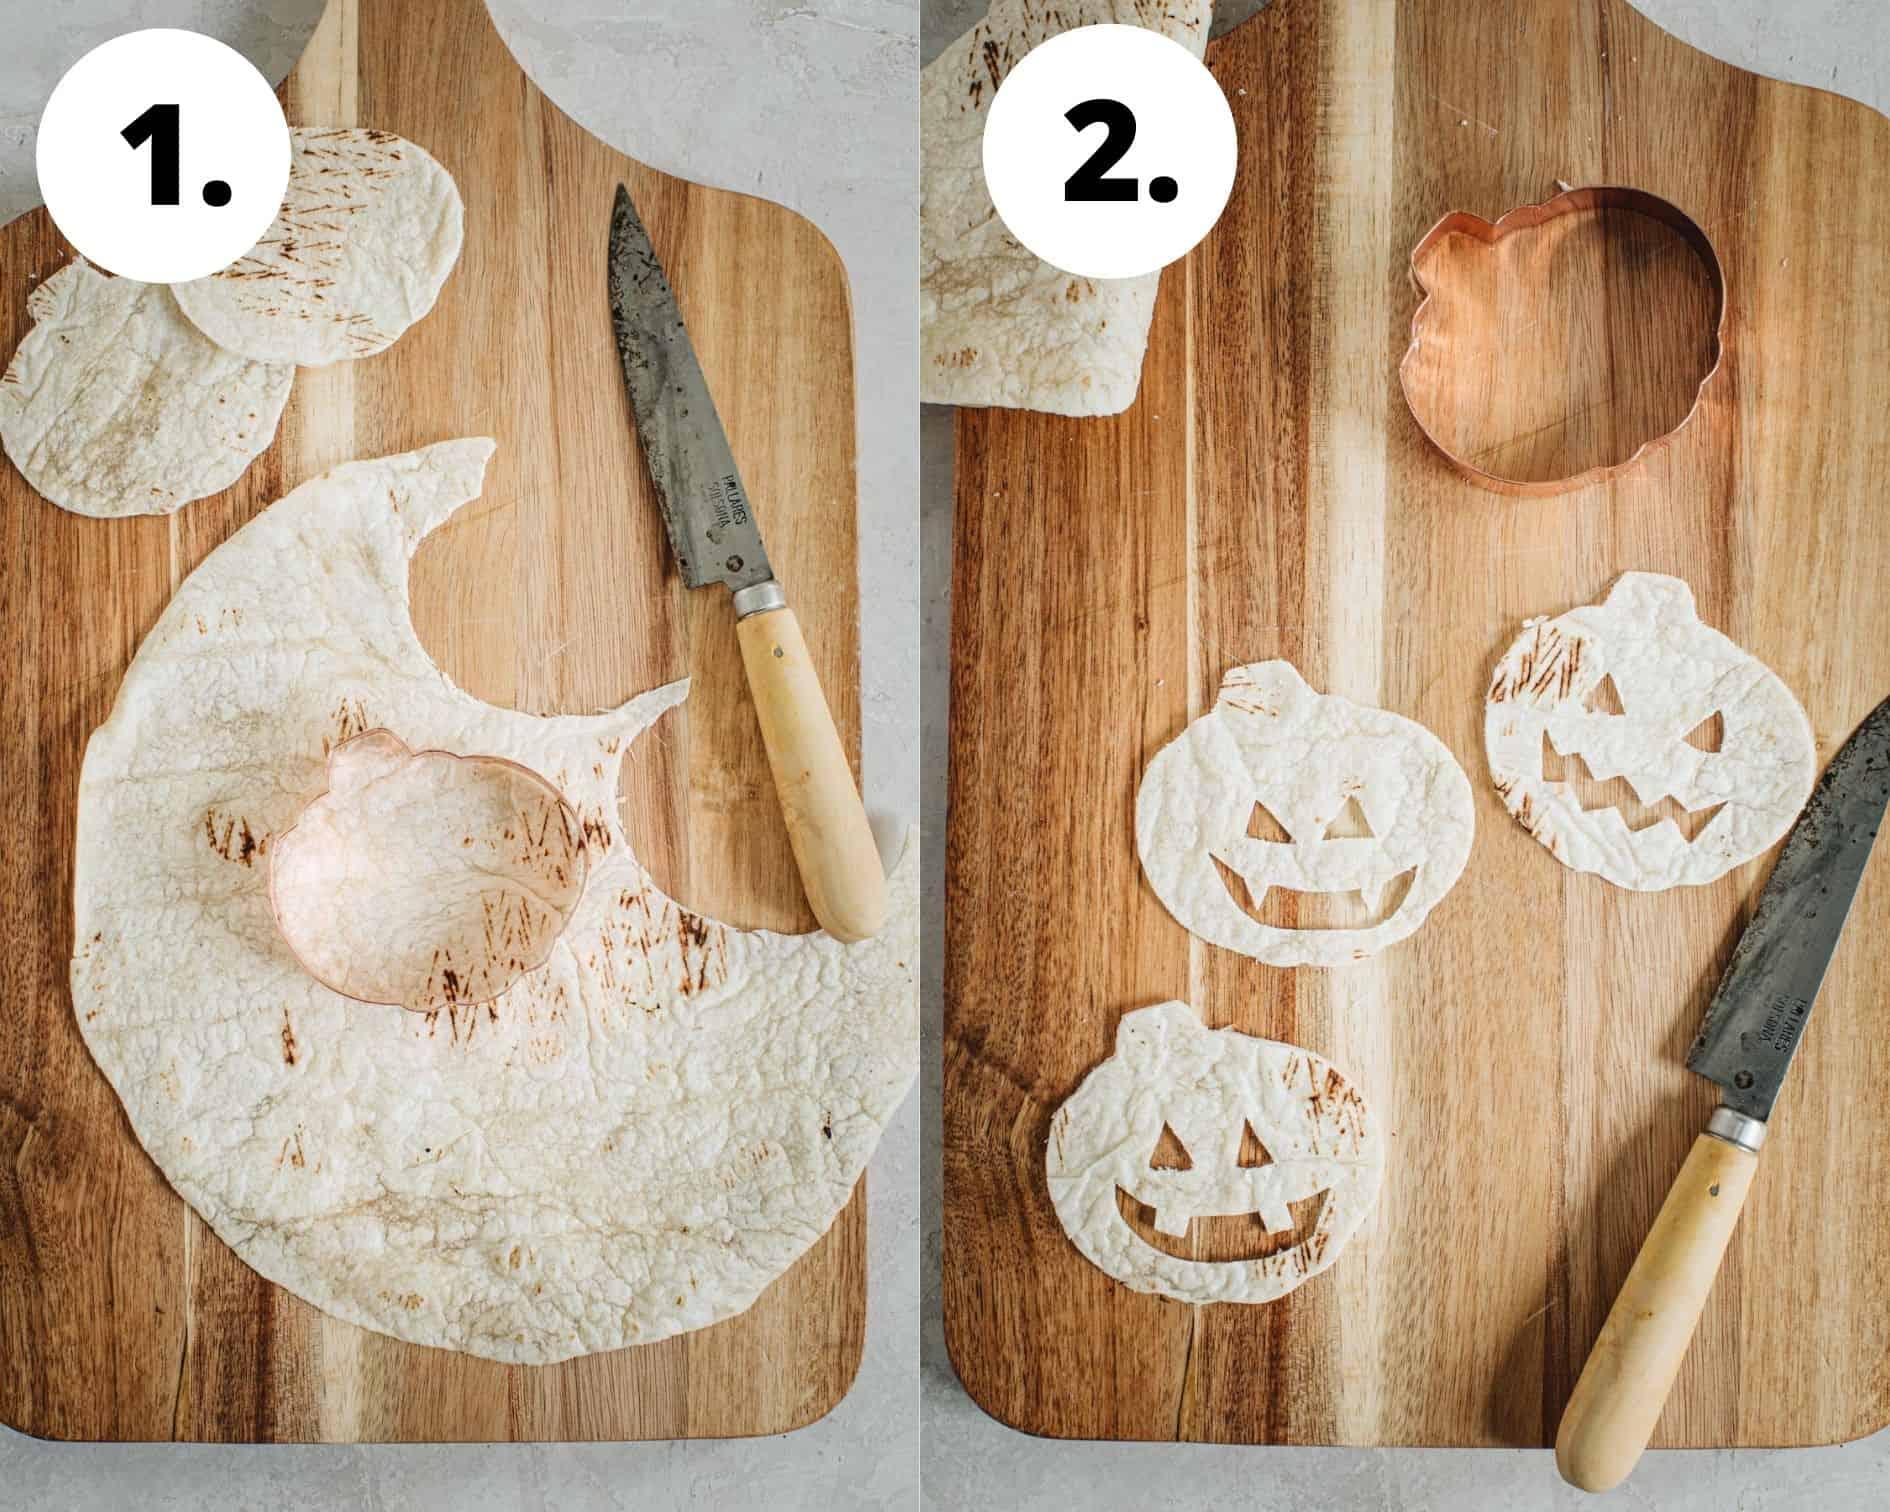 Jack-O-Lantern oven quesadillas process steps 1 and 2.